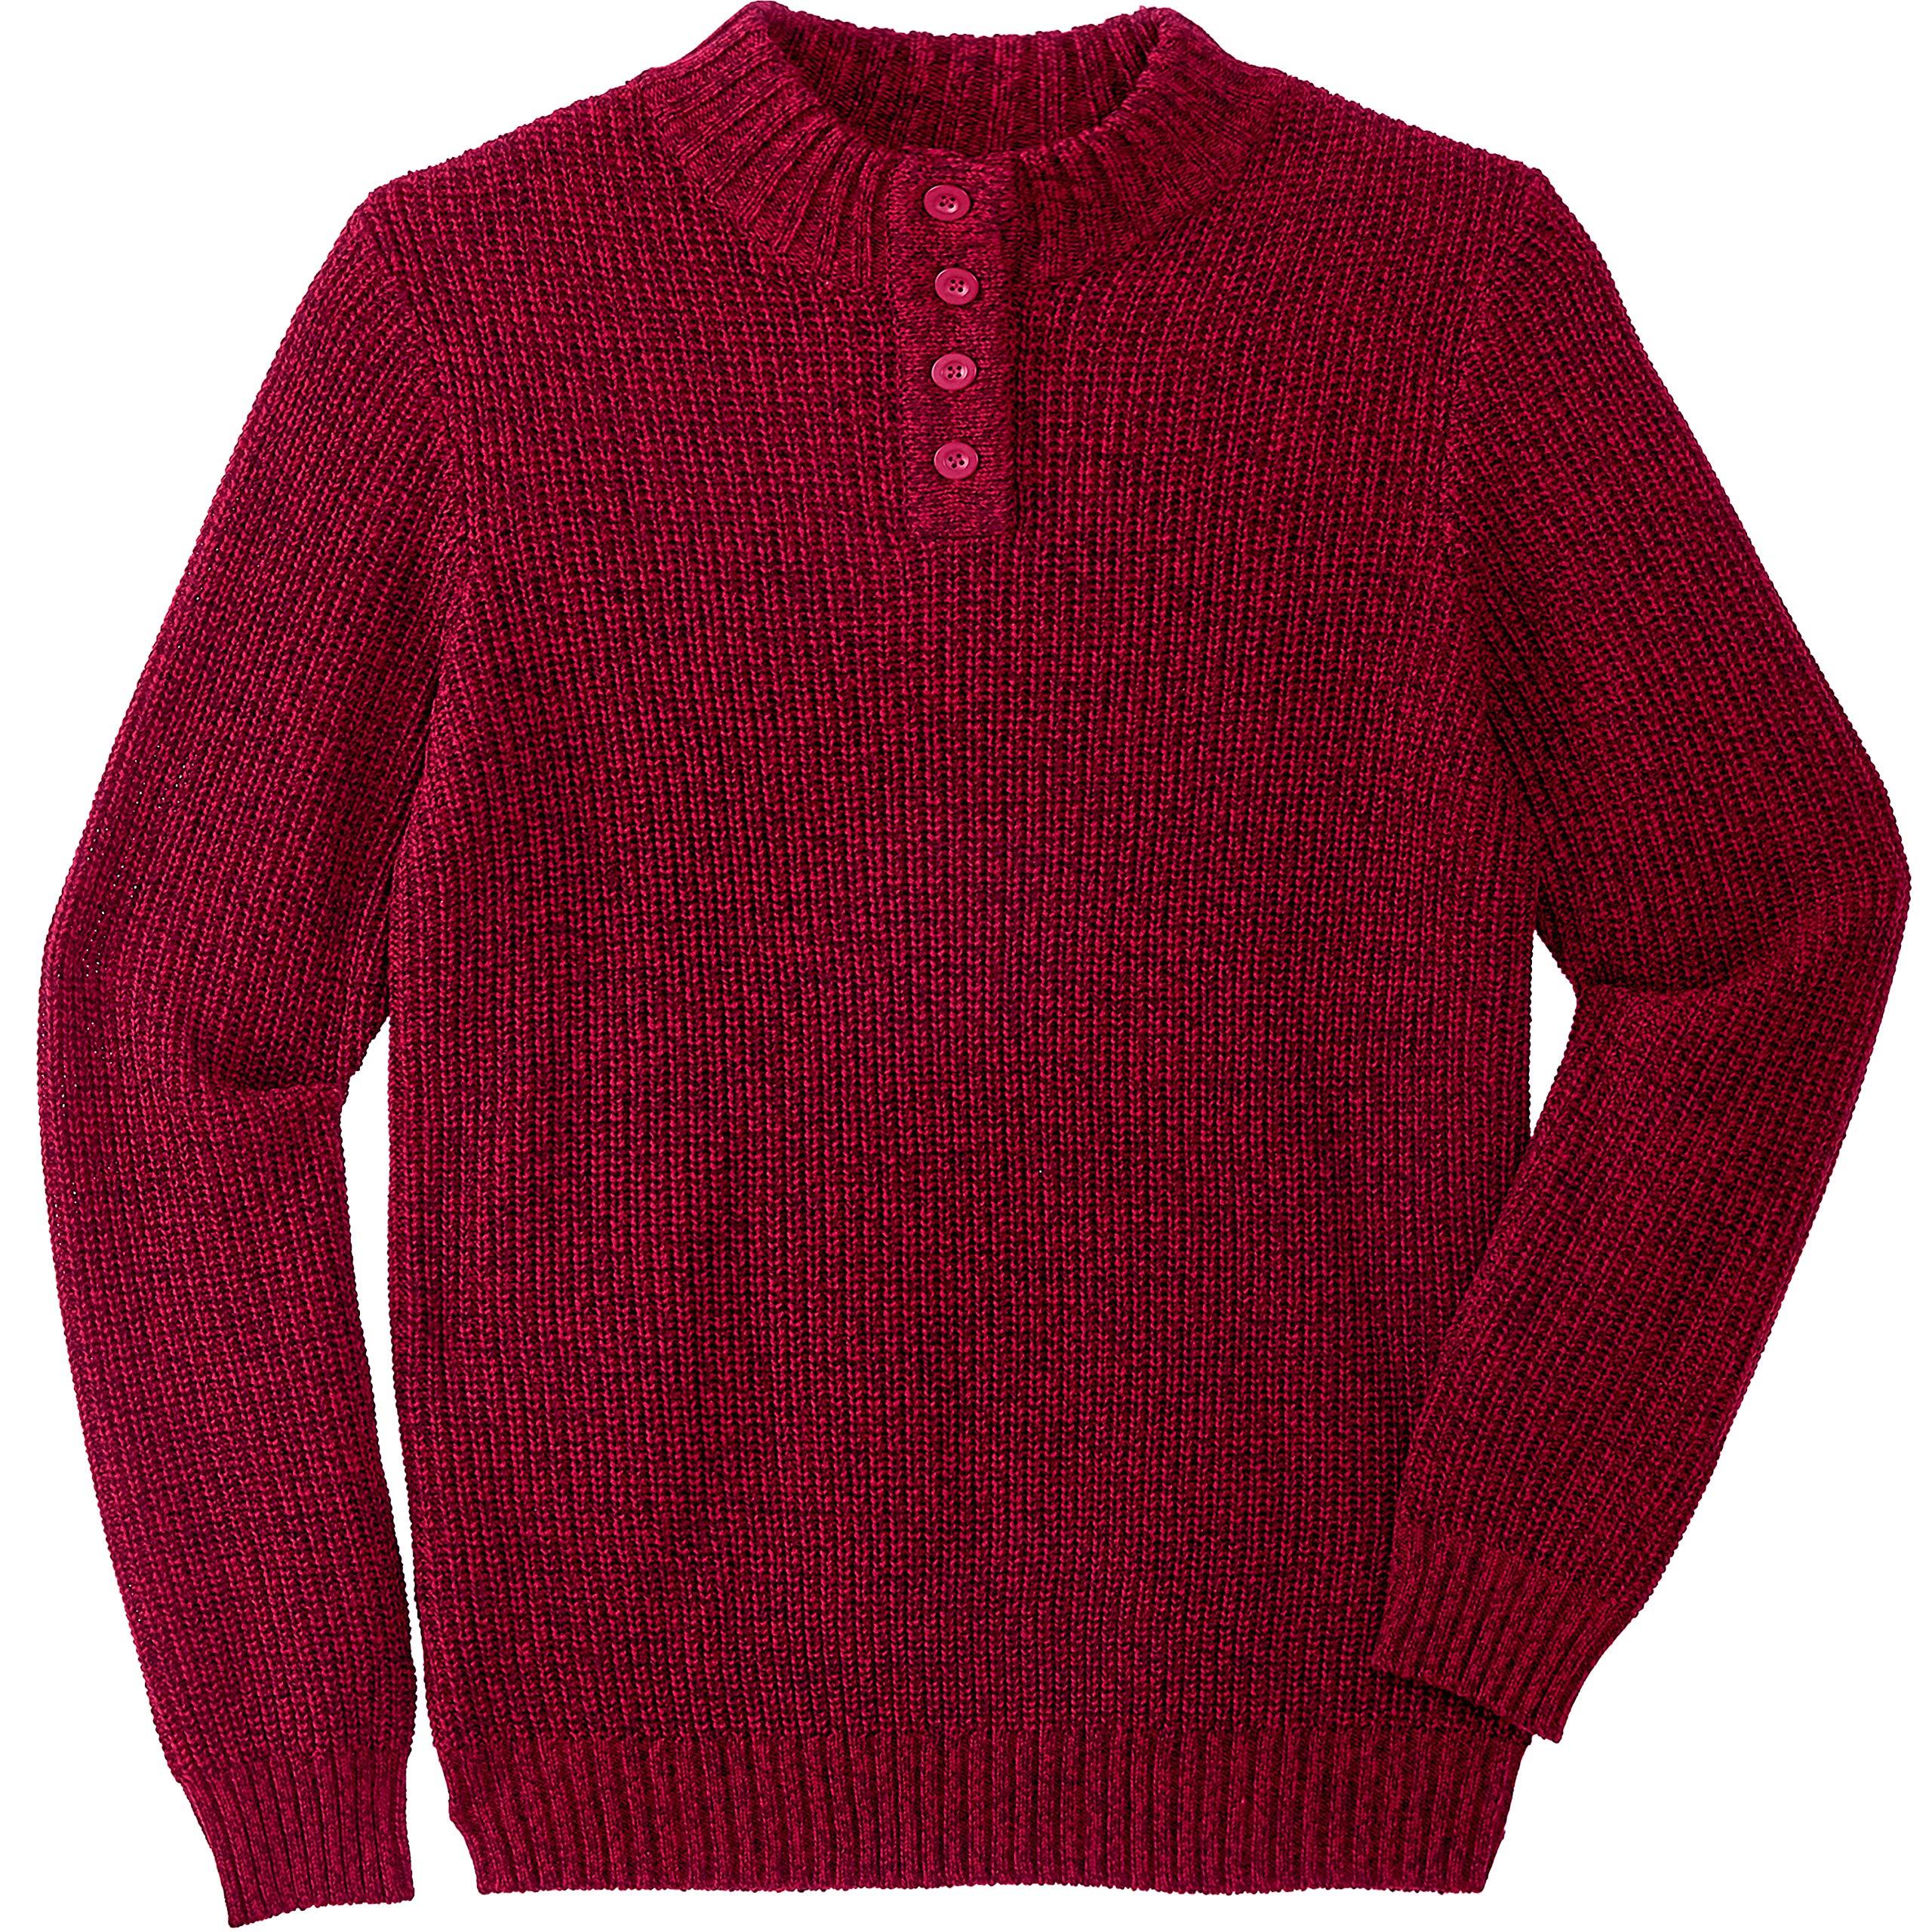 KingSize Men's Big & Tall Henley Shaker Sweater, Rich Burgundy Marl Tall-5XL by KingSize